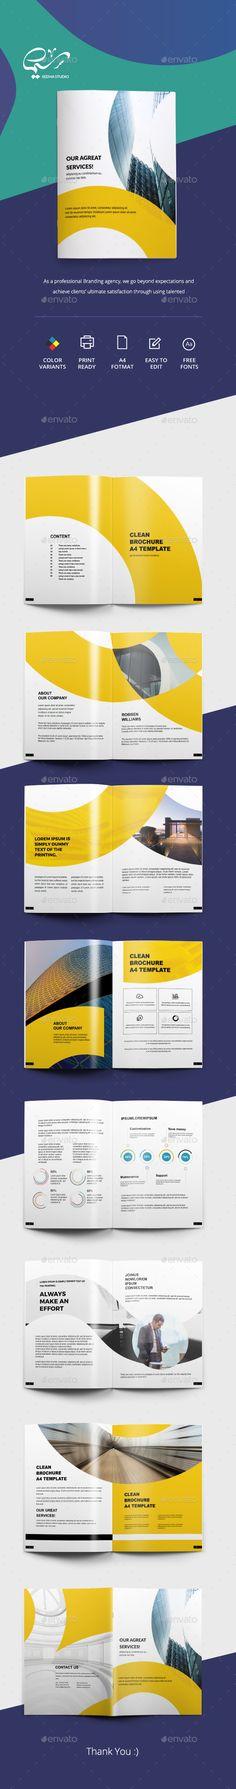 Business Brochure — InDesign INDD #professional #design • Download ➝ https://graphicriver.net/item/business-brochure/20336122?ref=pxcr